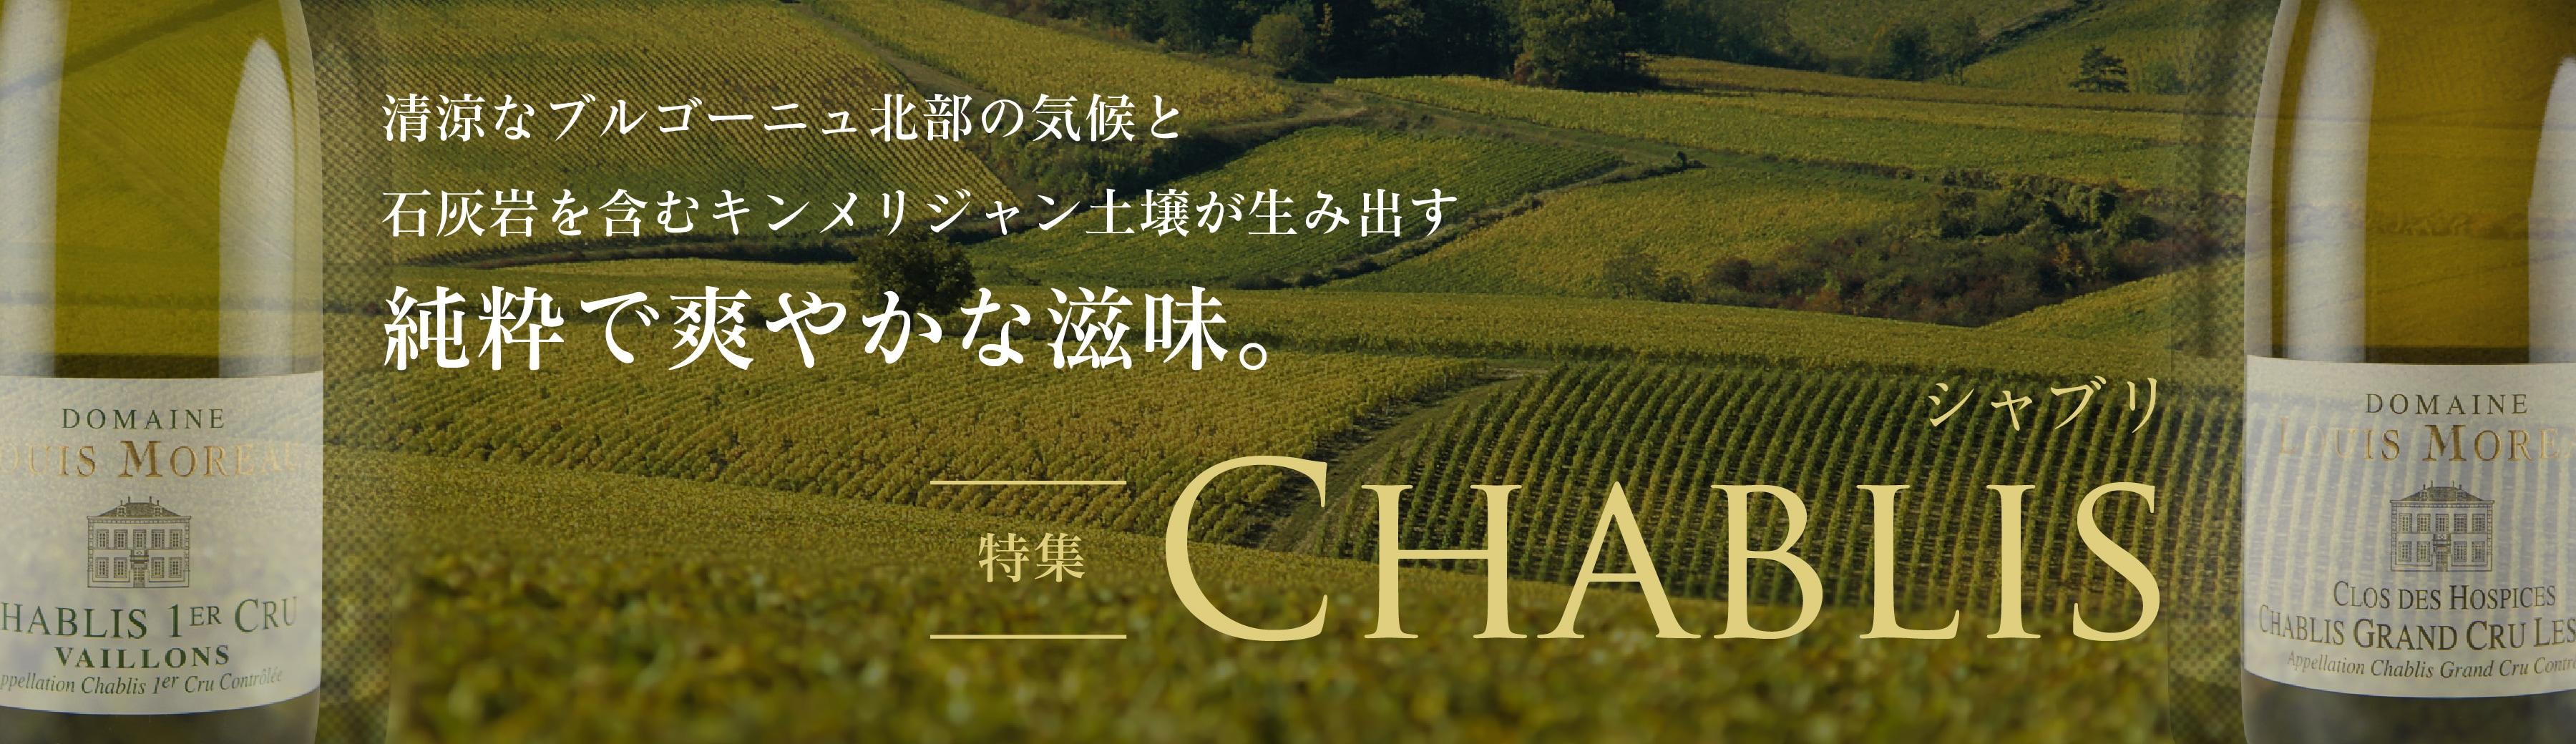 Chablis - シャブリ特集